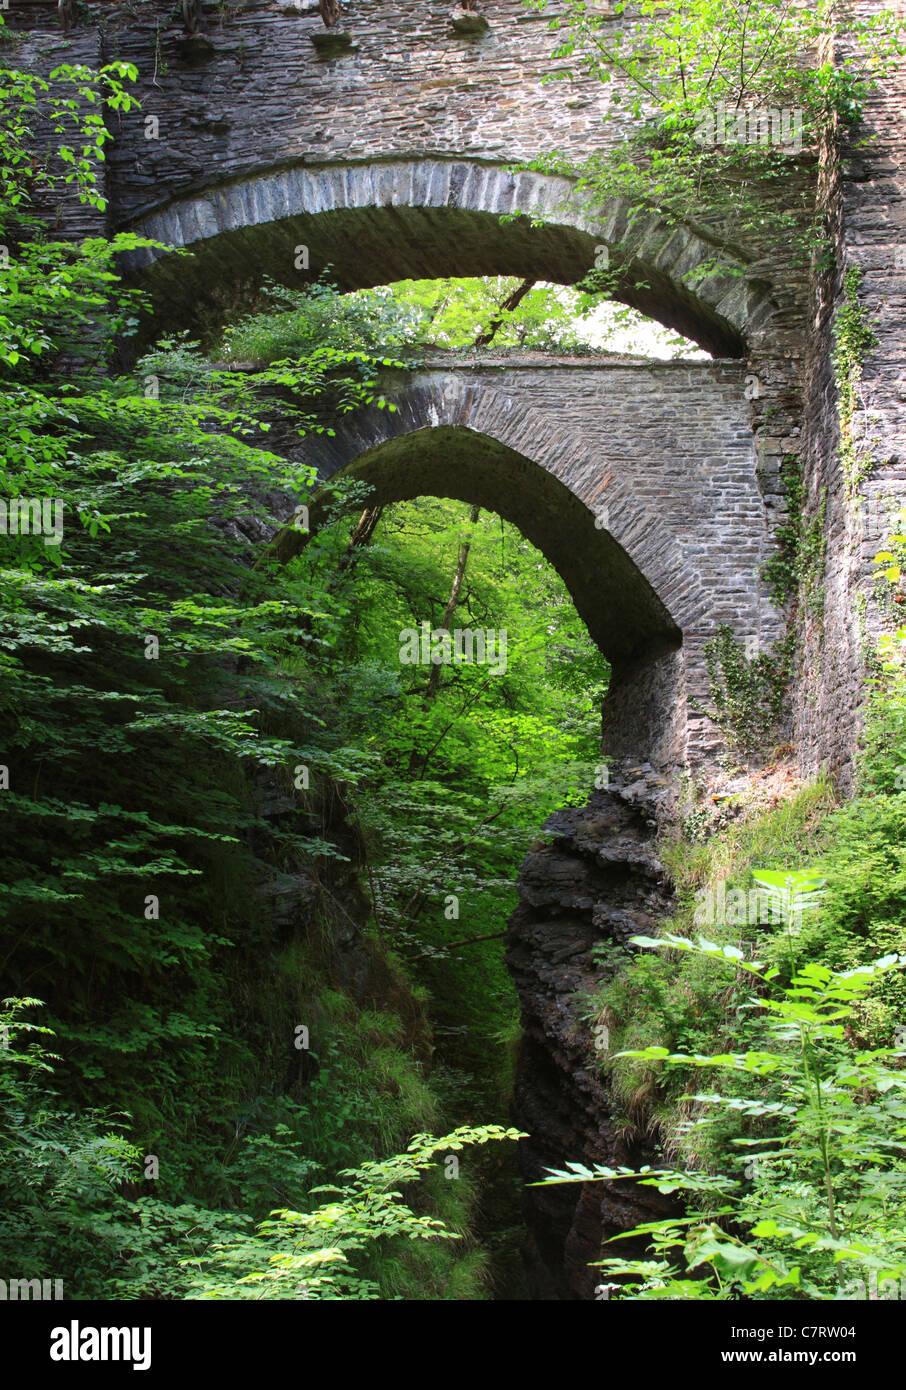 Devil's Bridge, Ceredigion, Wales, Europe - Stock Image